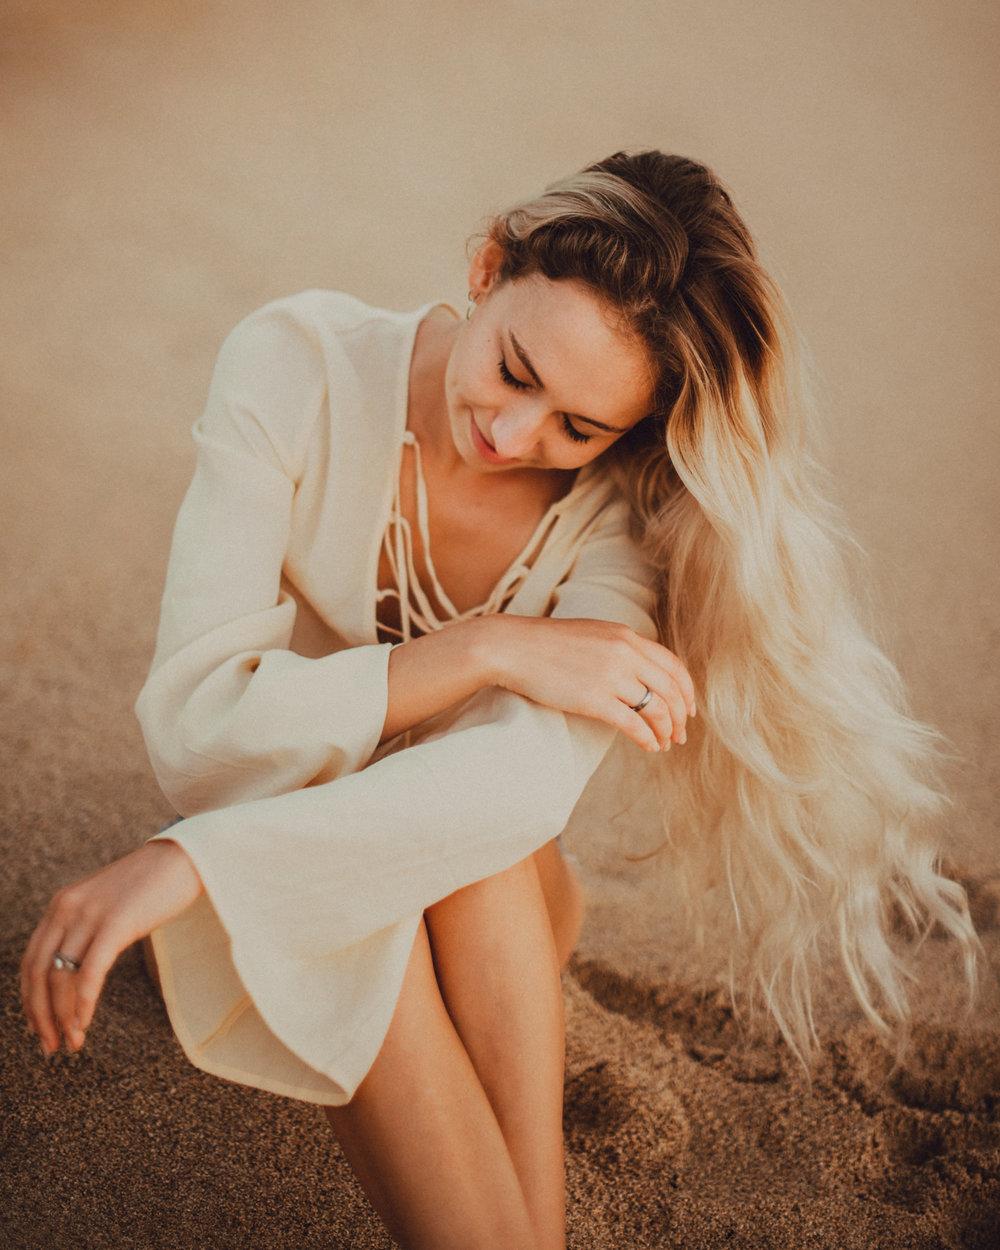 Marianne | Creative Portrait